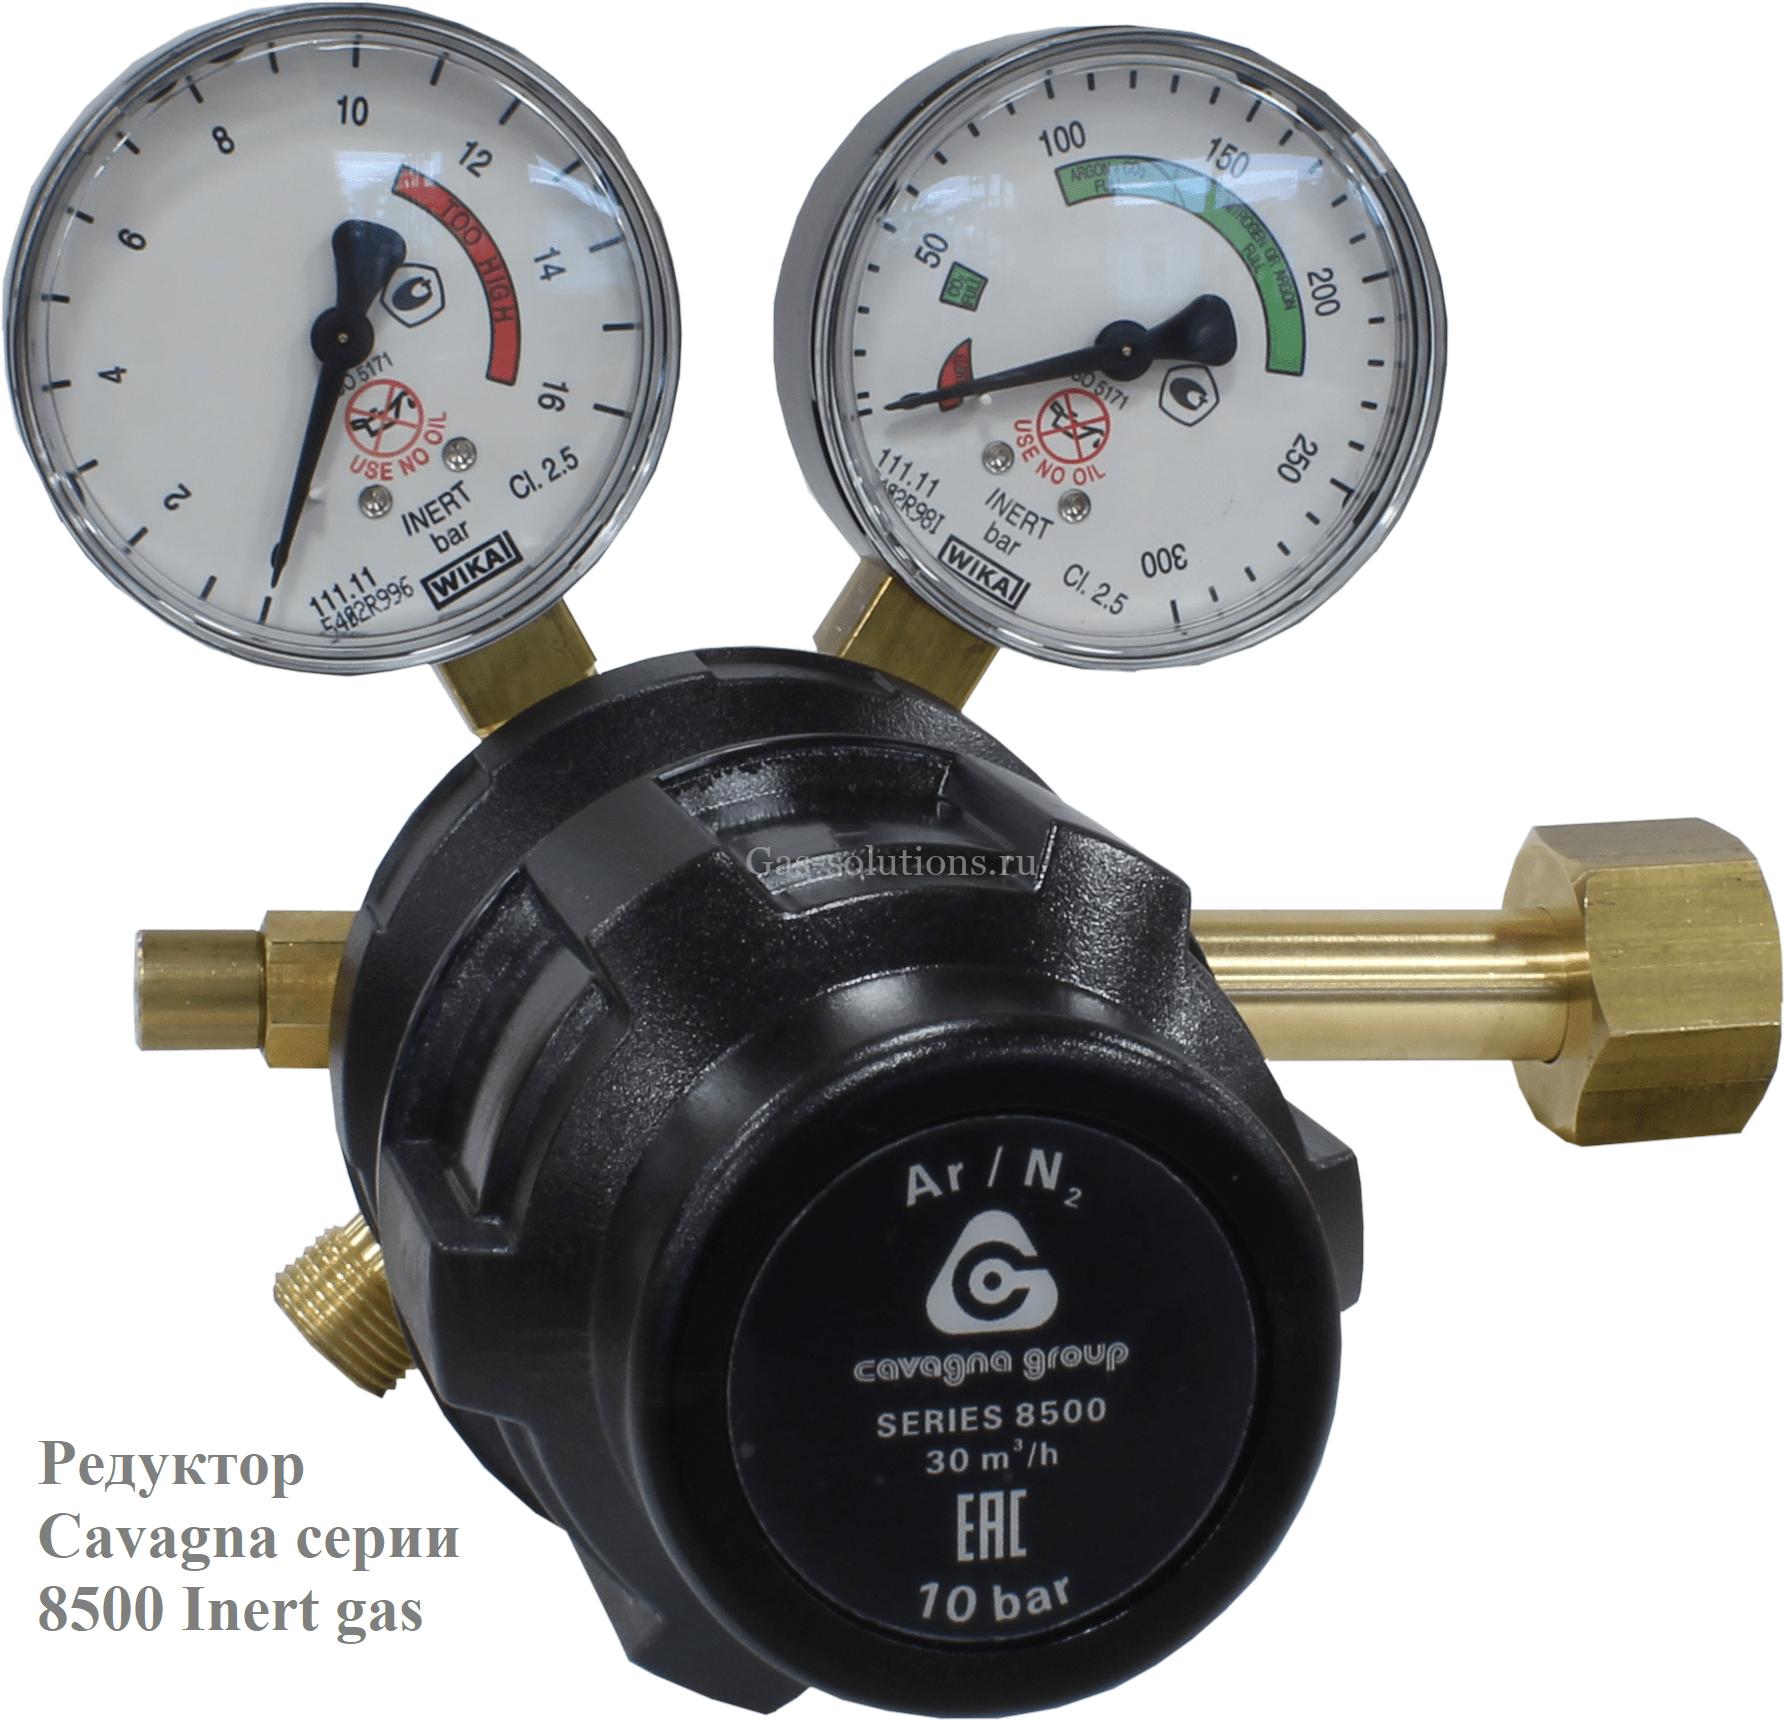 Редуктор Cavagna серии 8500 Inert gas_1